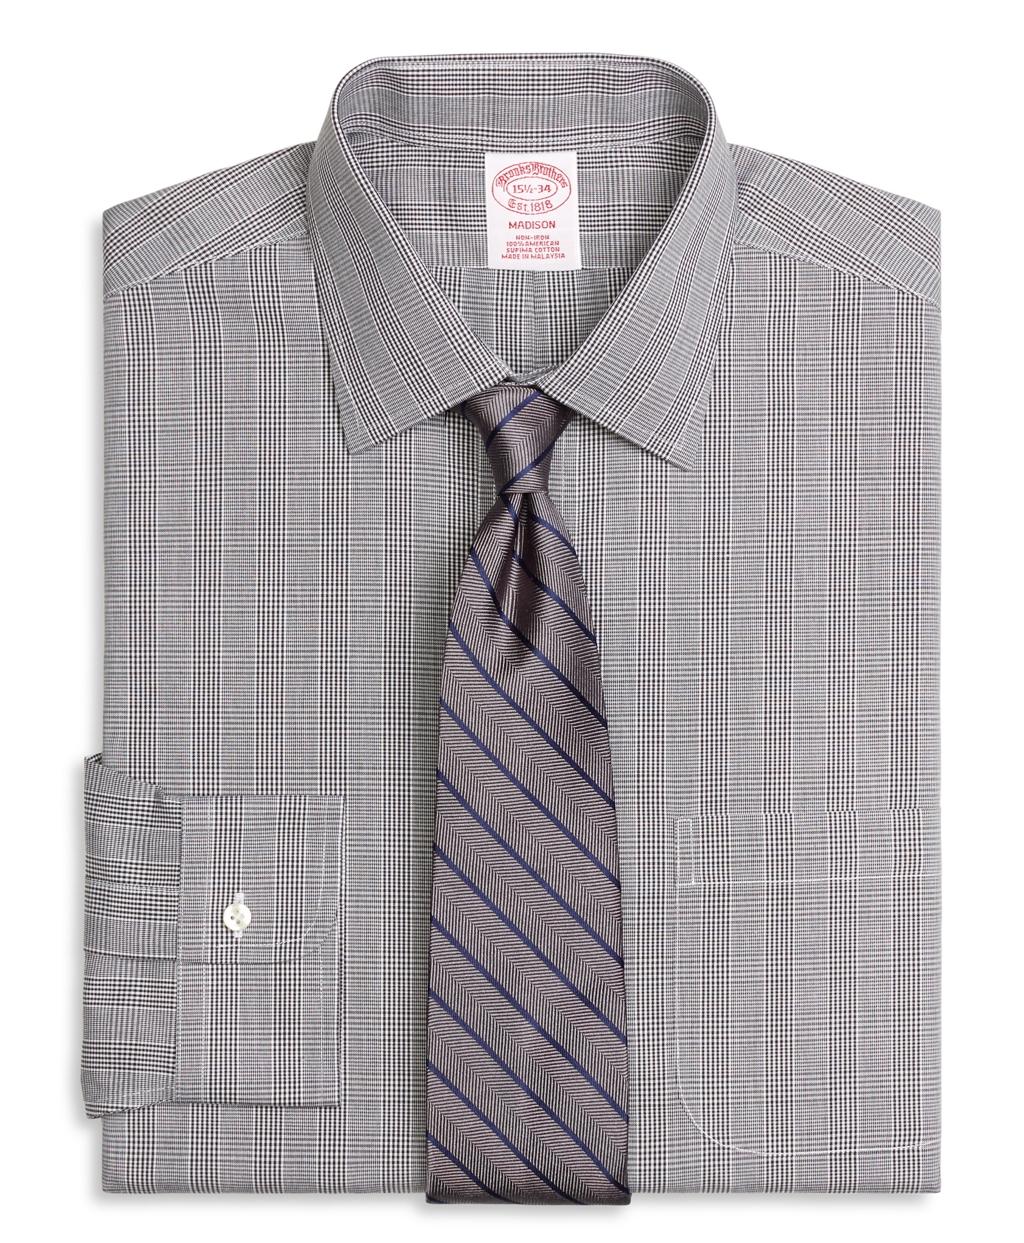 Brooks brothers non iron madison fit glen plaid dress for Brooks brothers non iron shirts review